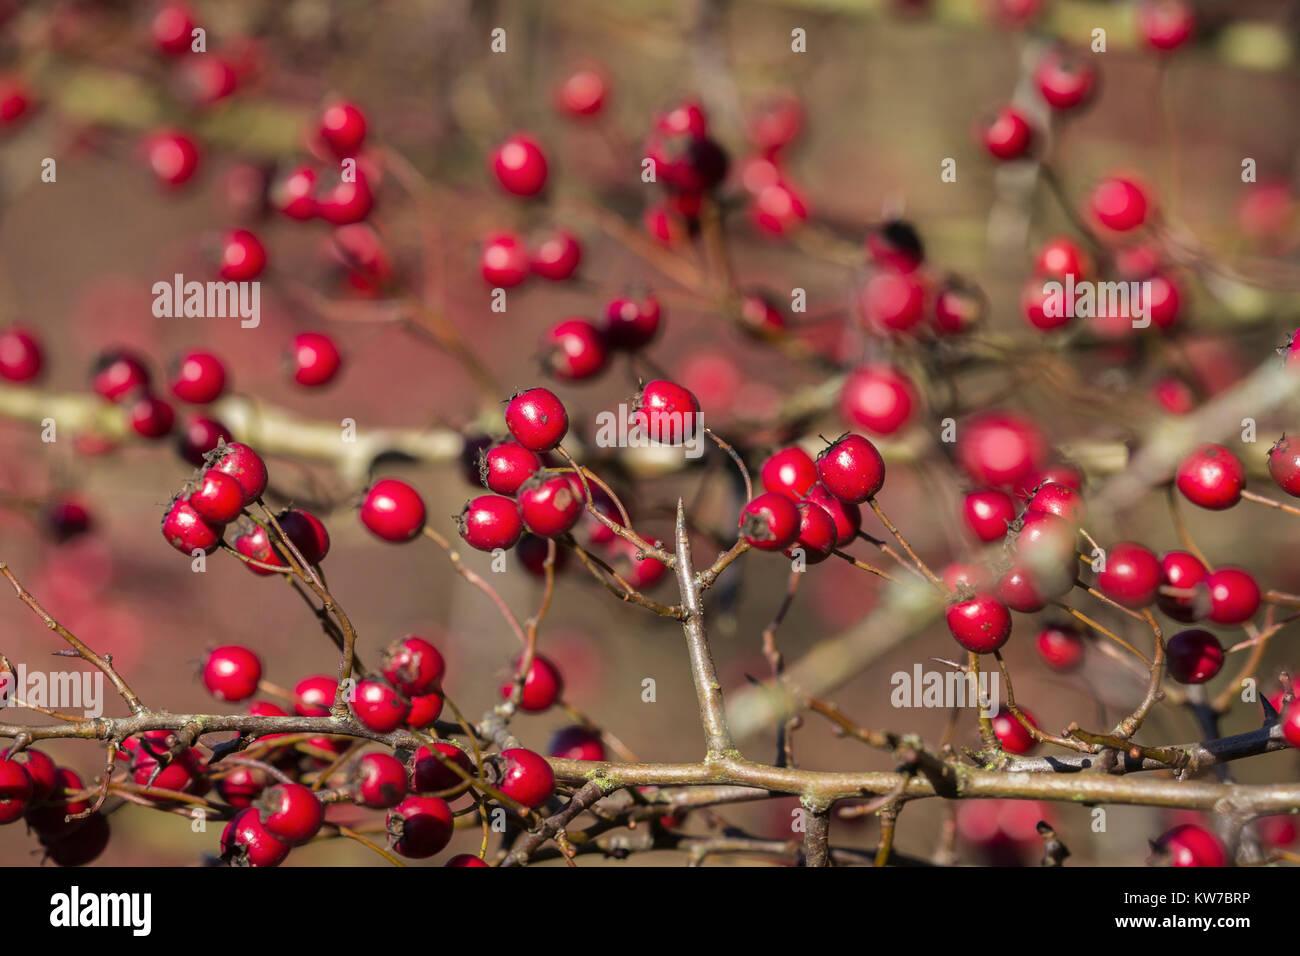 Hawthorn (Crataegus monogyna) berries, Caerlaverock Wildfowl and Wetland Trust reserve, Dumfries & Galloway, - Stock Image